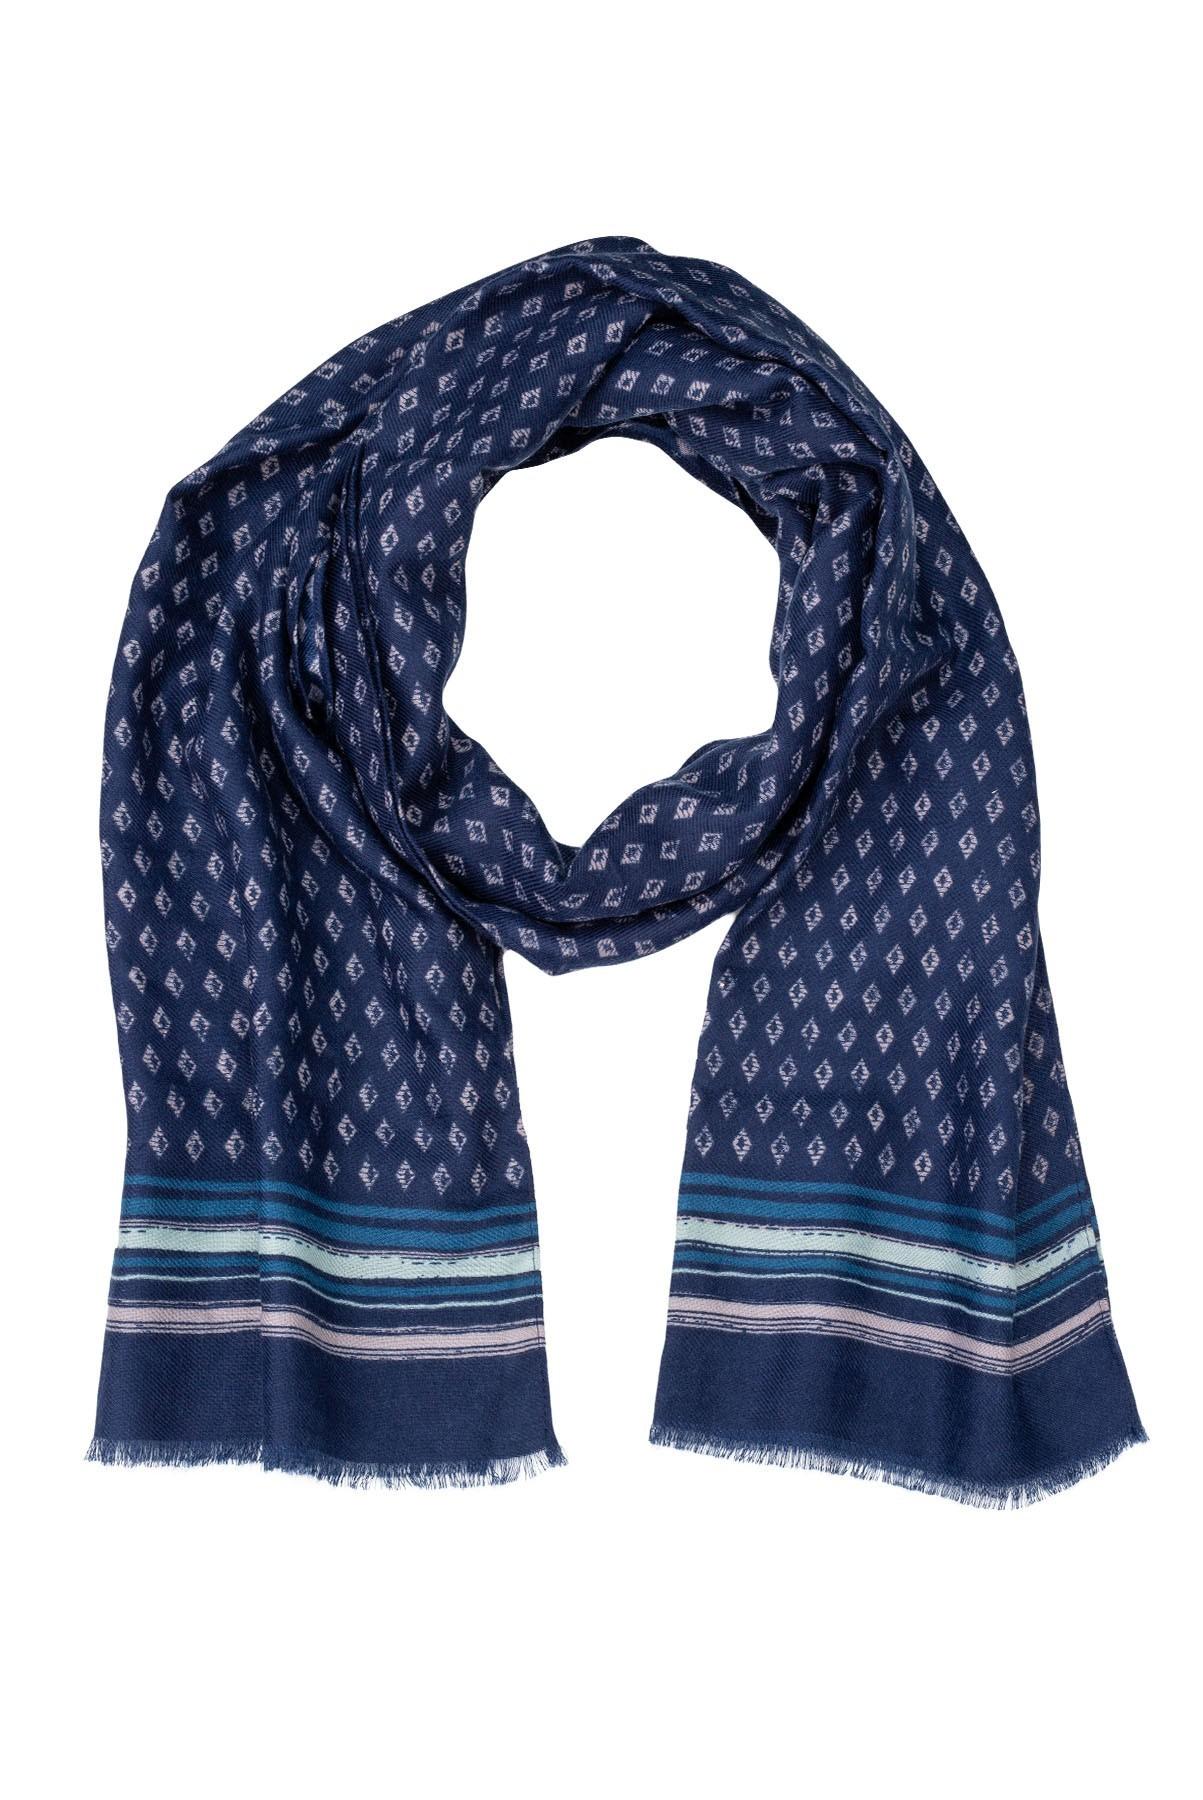 Men's scarf.